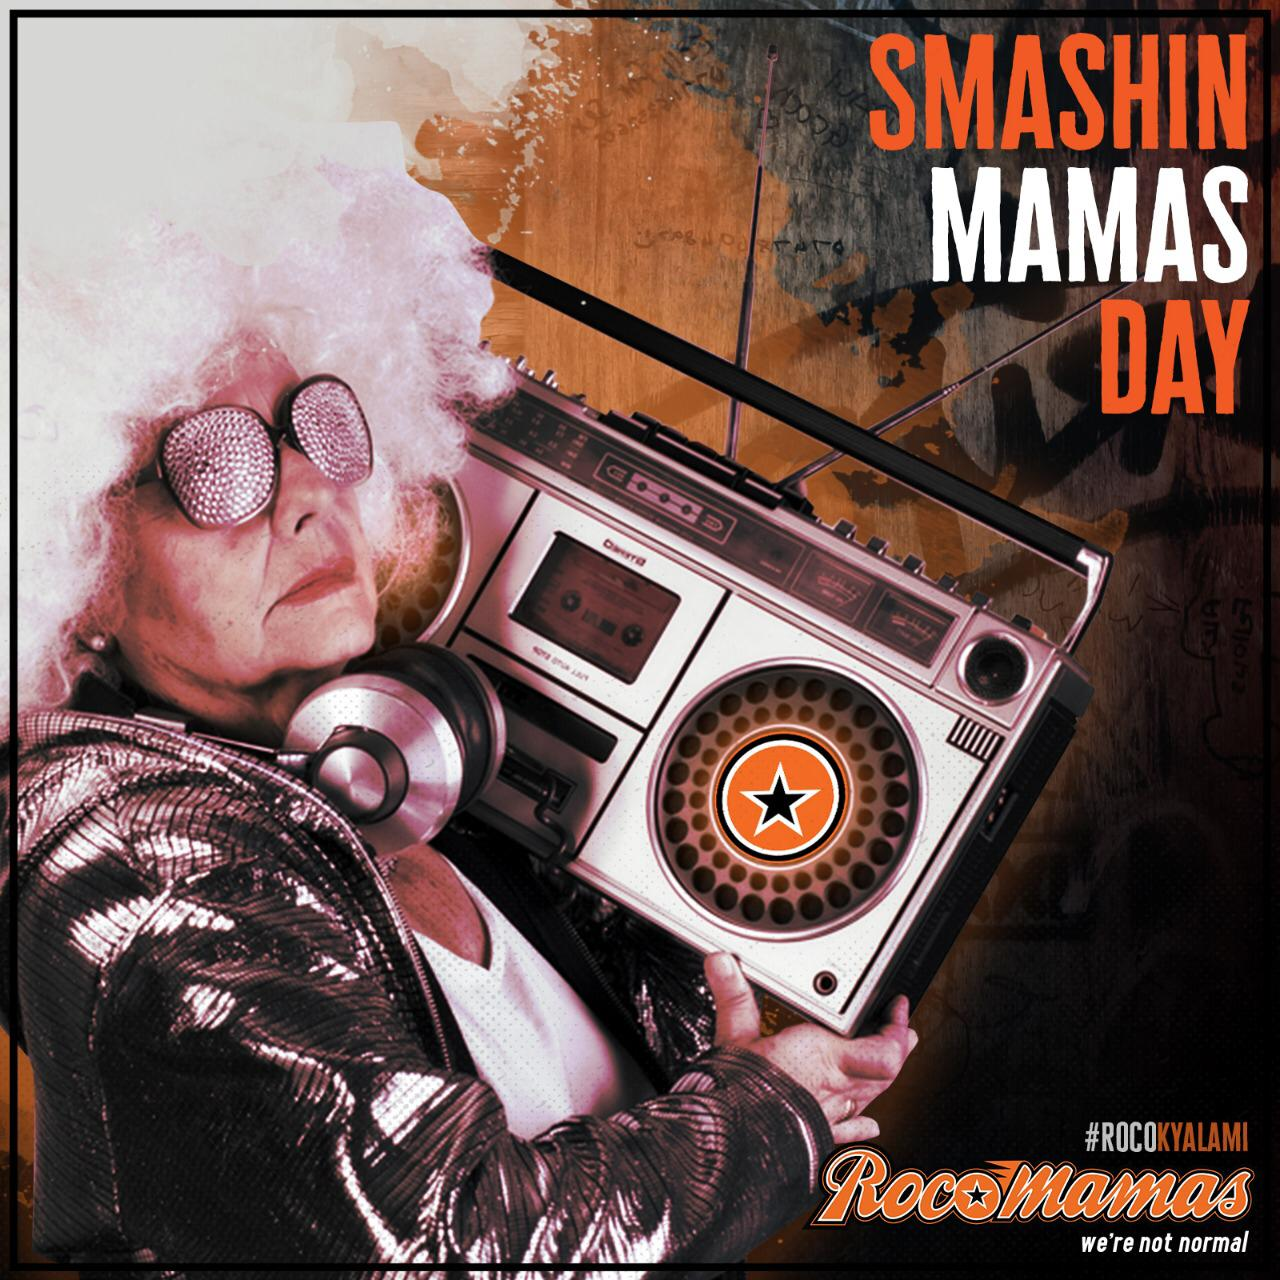 Smashin Mamas Day – RocoMamas